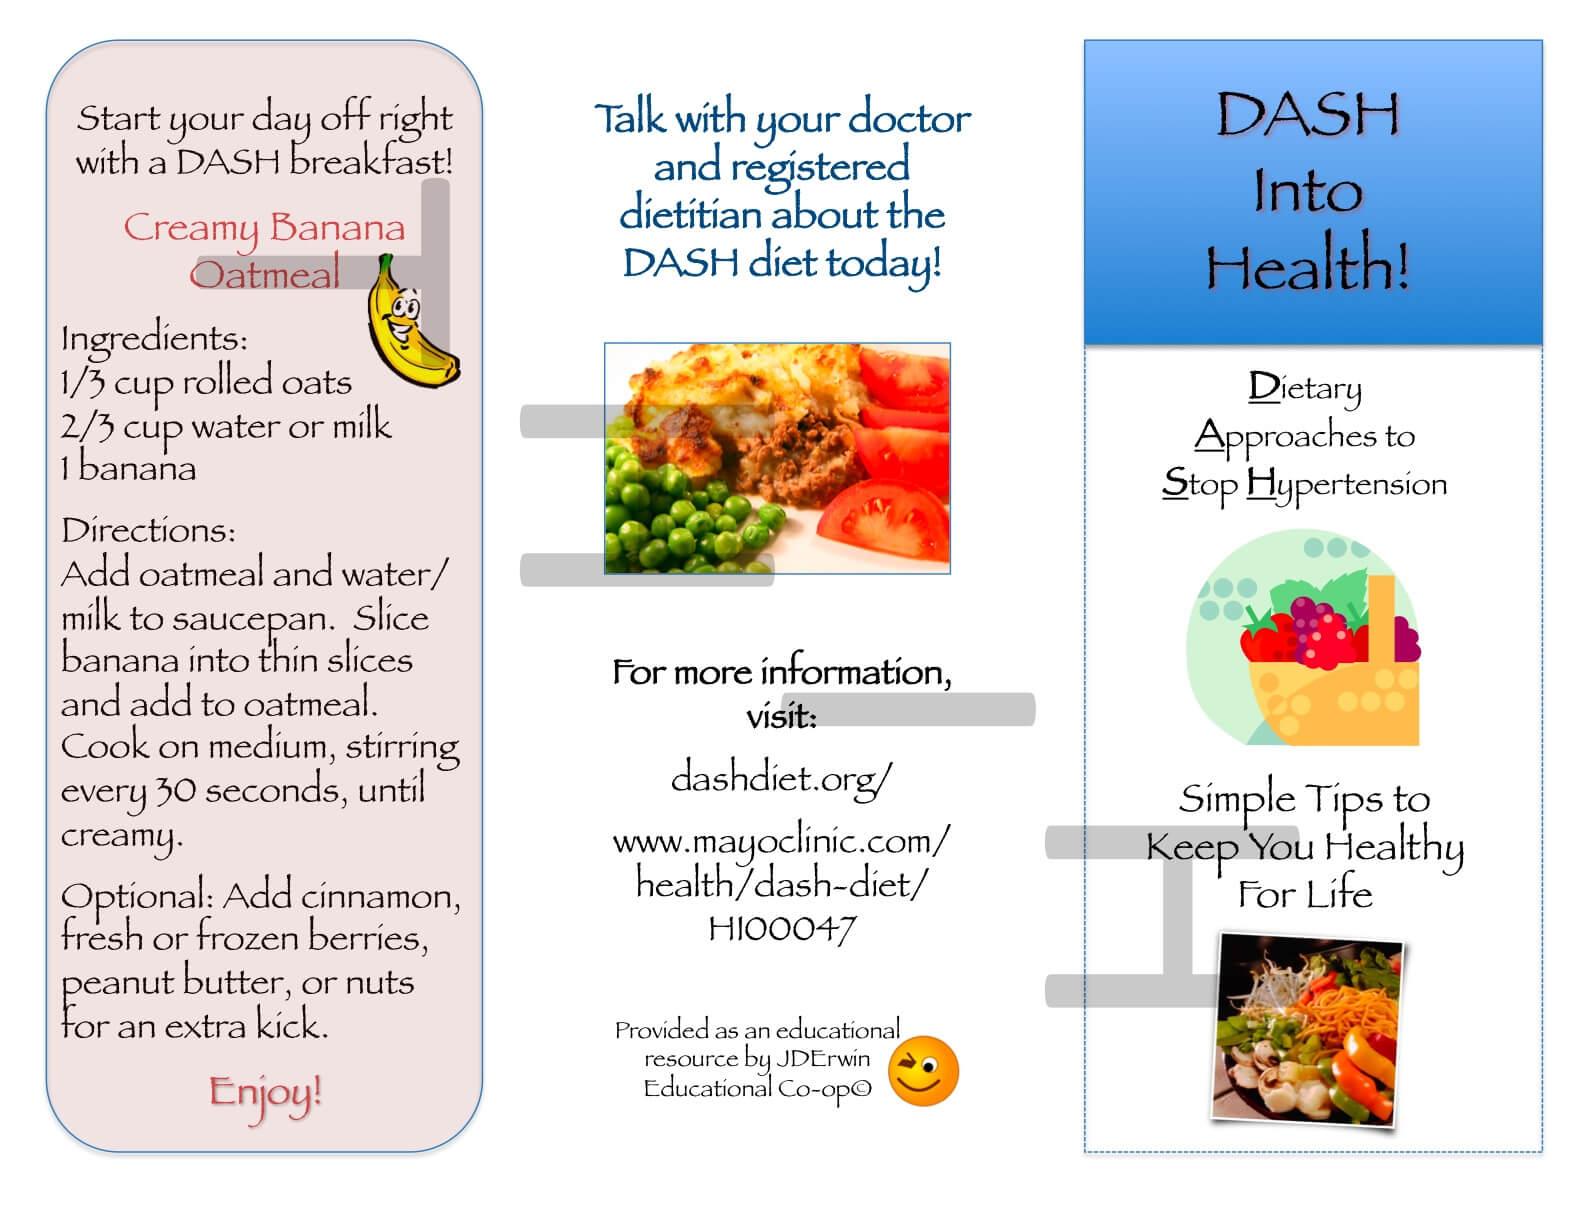 Dash Diet Brochure   Nutr 360 In Nutrition Brochure Template